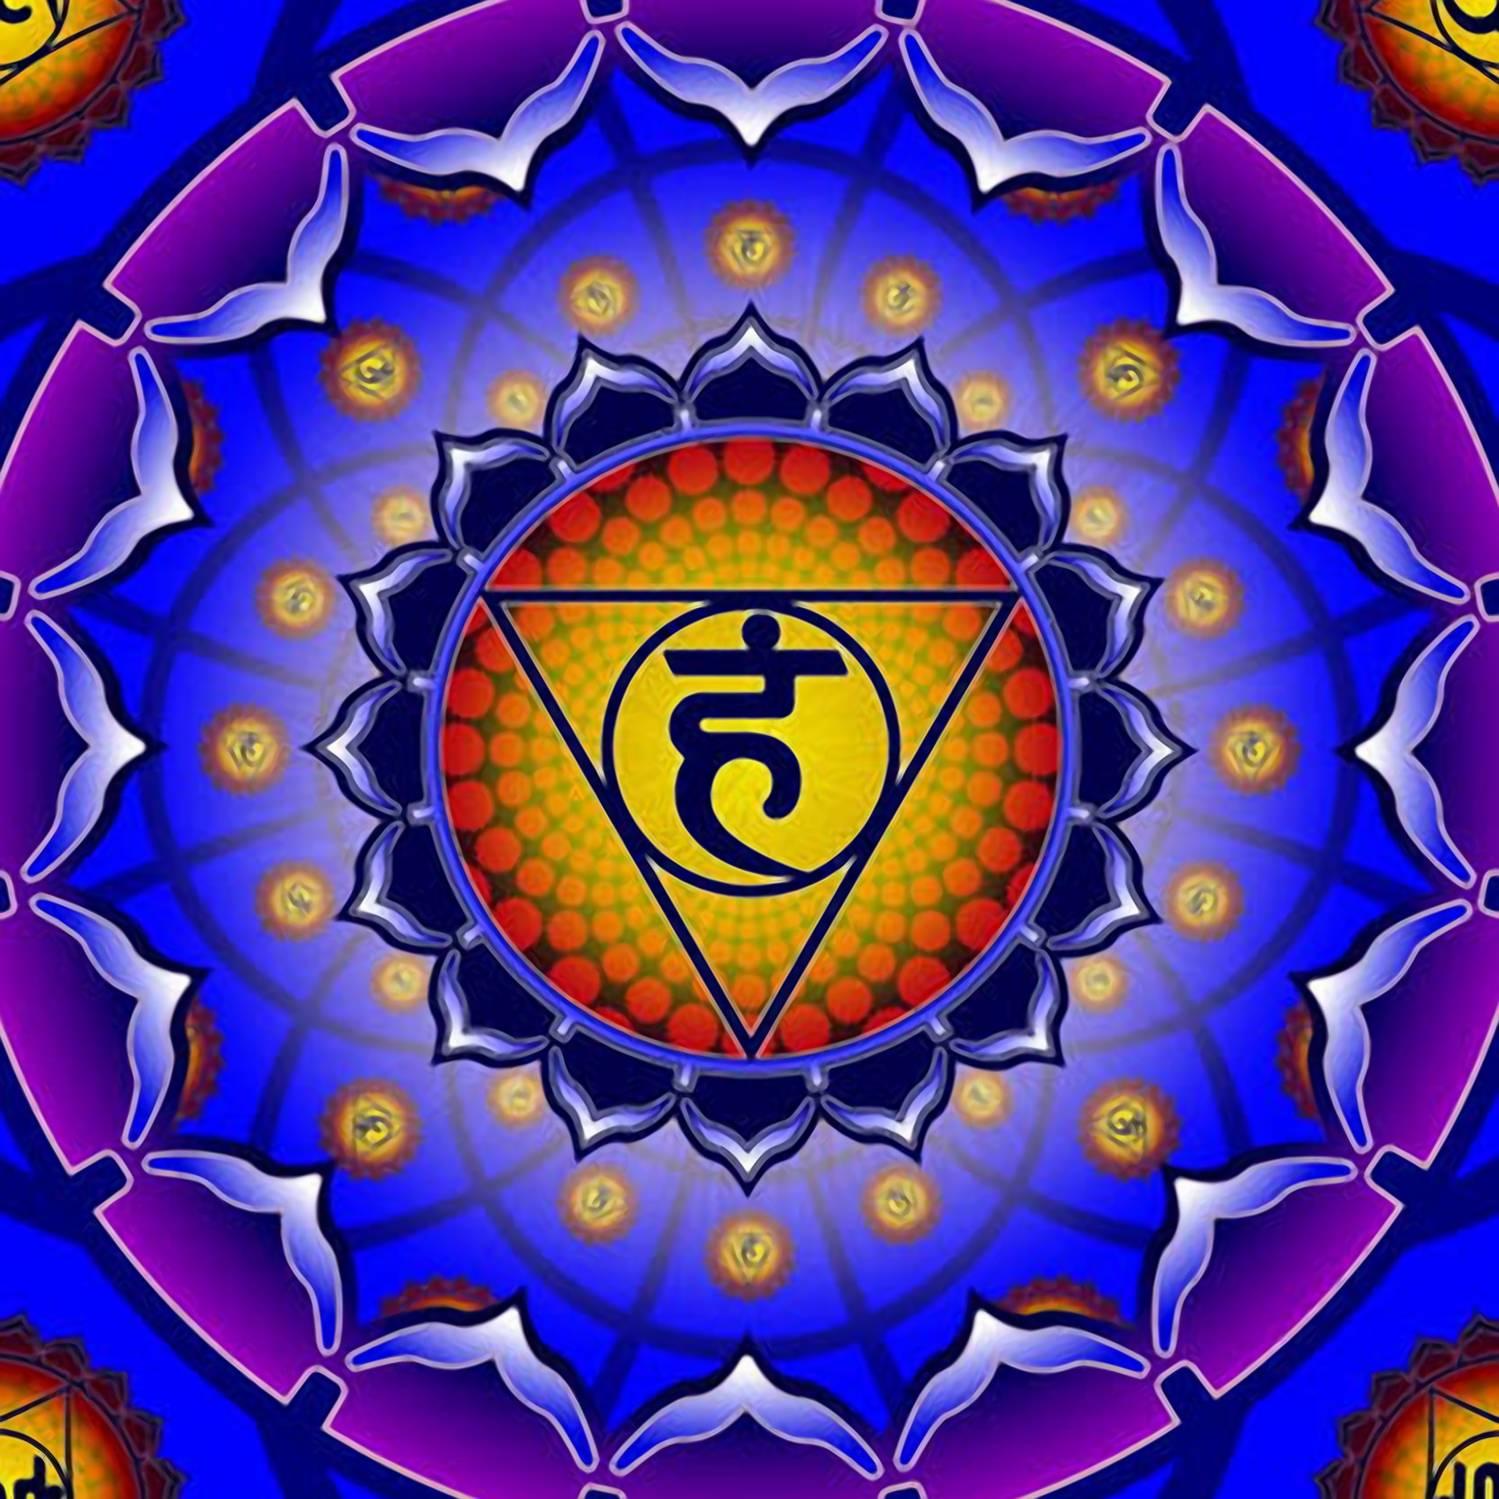 Пятая, горловая чакра - Вишудха